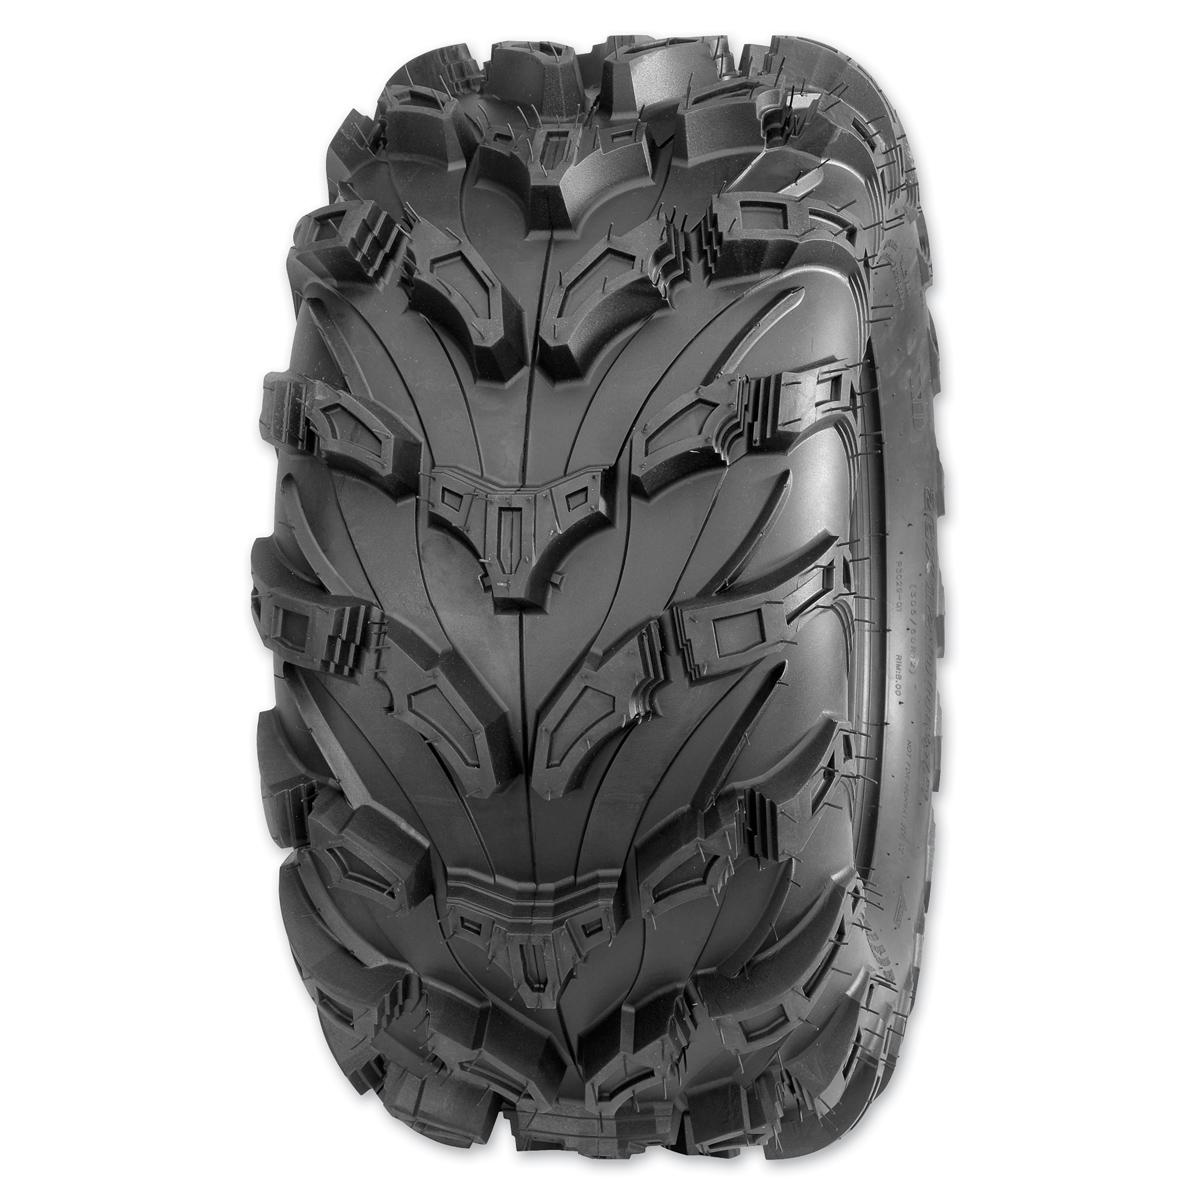 Quadboss QBT672 26X12R12 8-Ply Rear Tire